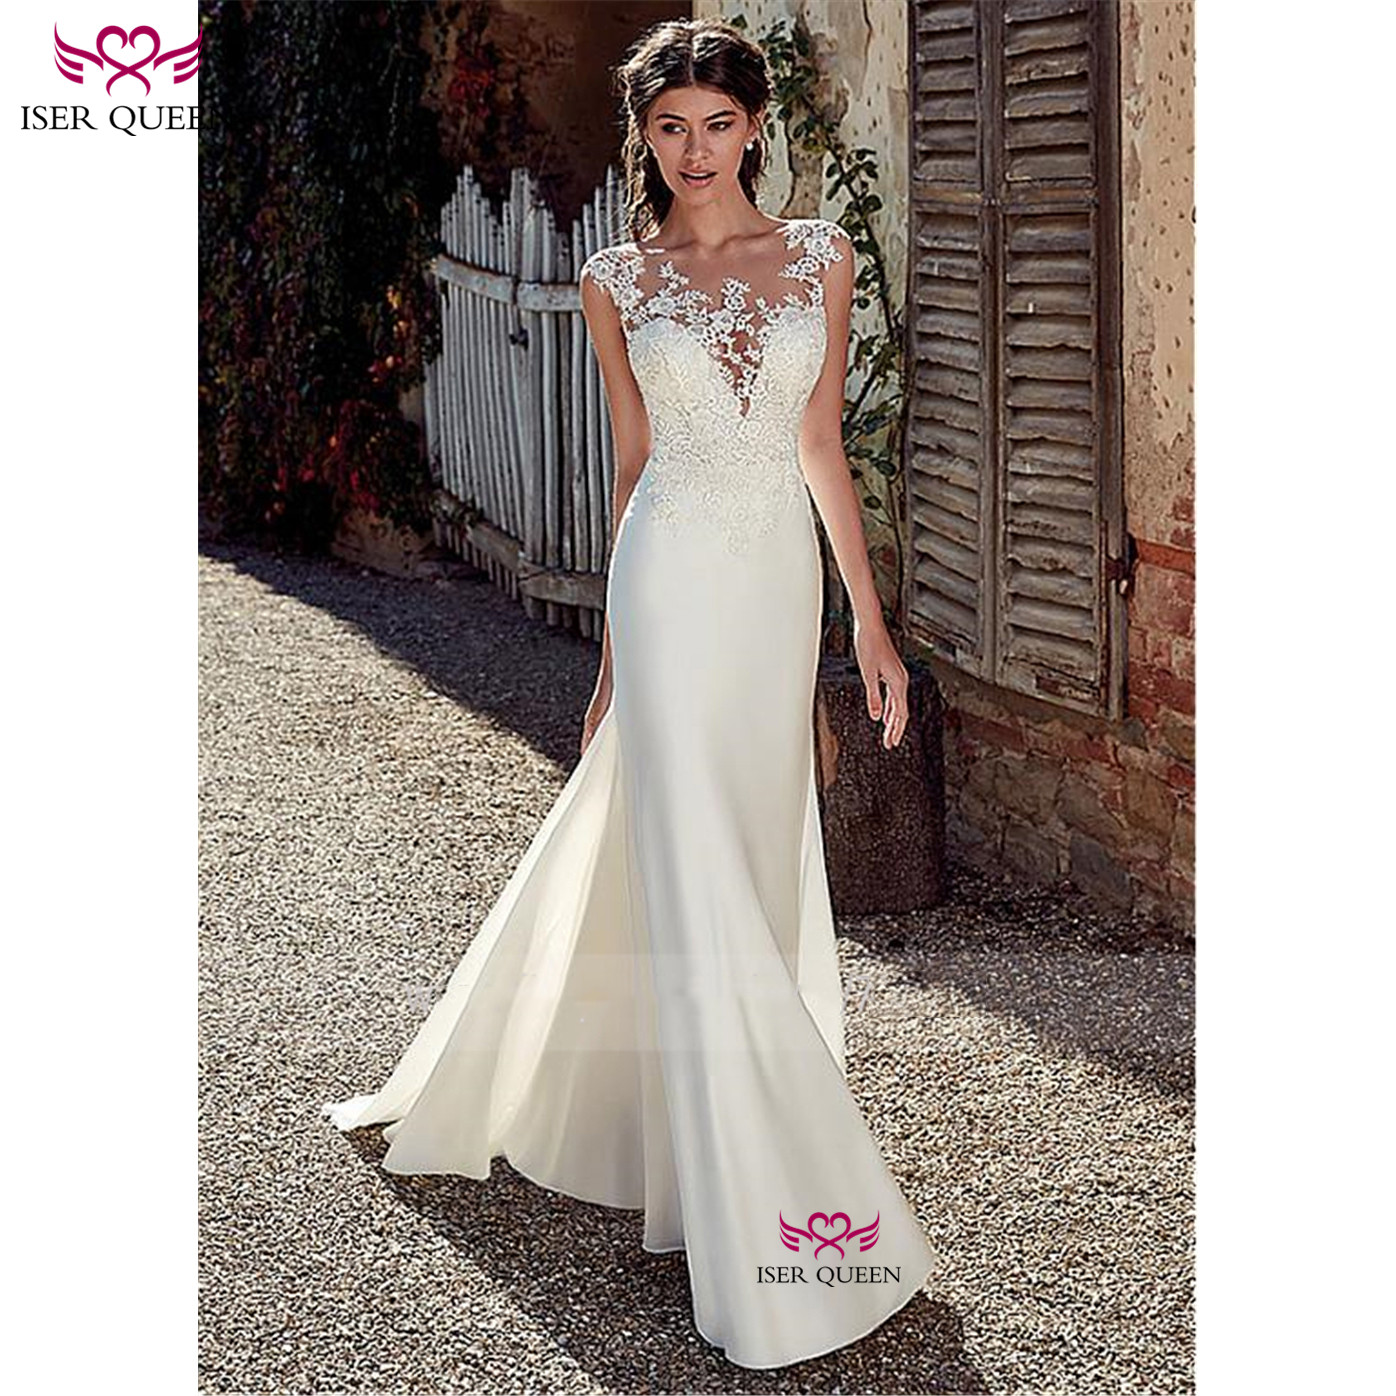 New Europe Style Chiffon Mermaid Wedding Dress Embroidery Deep V-neckline Vestido De Noiva Ivory Bride Dress W0517